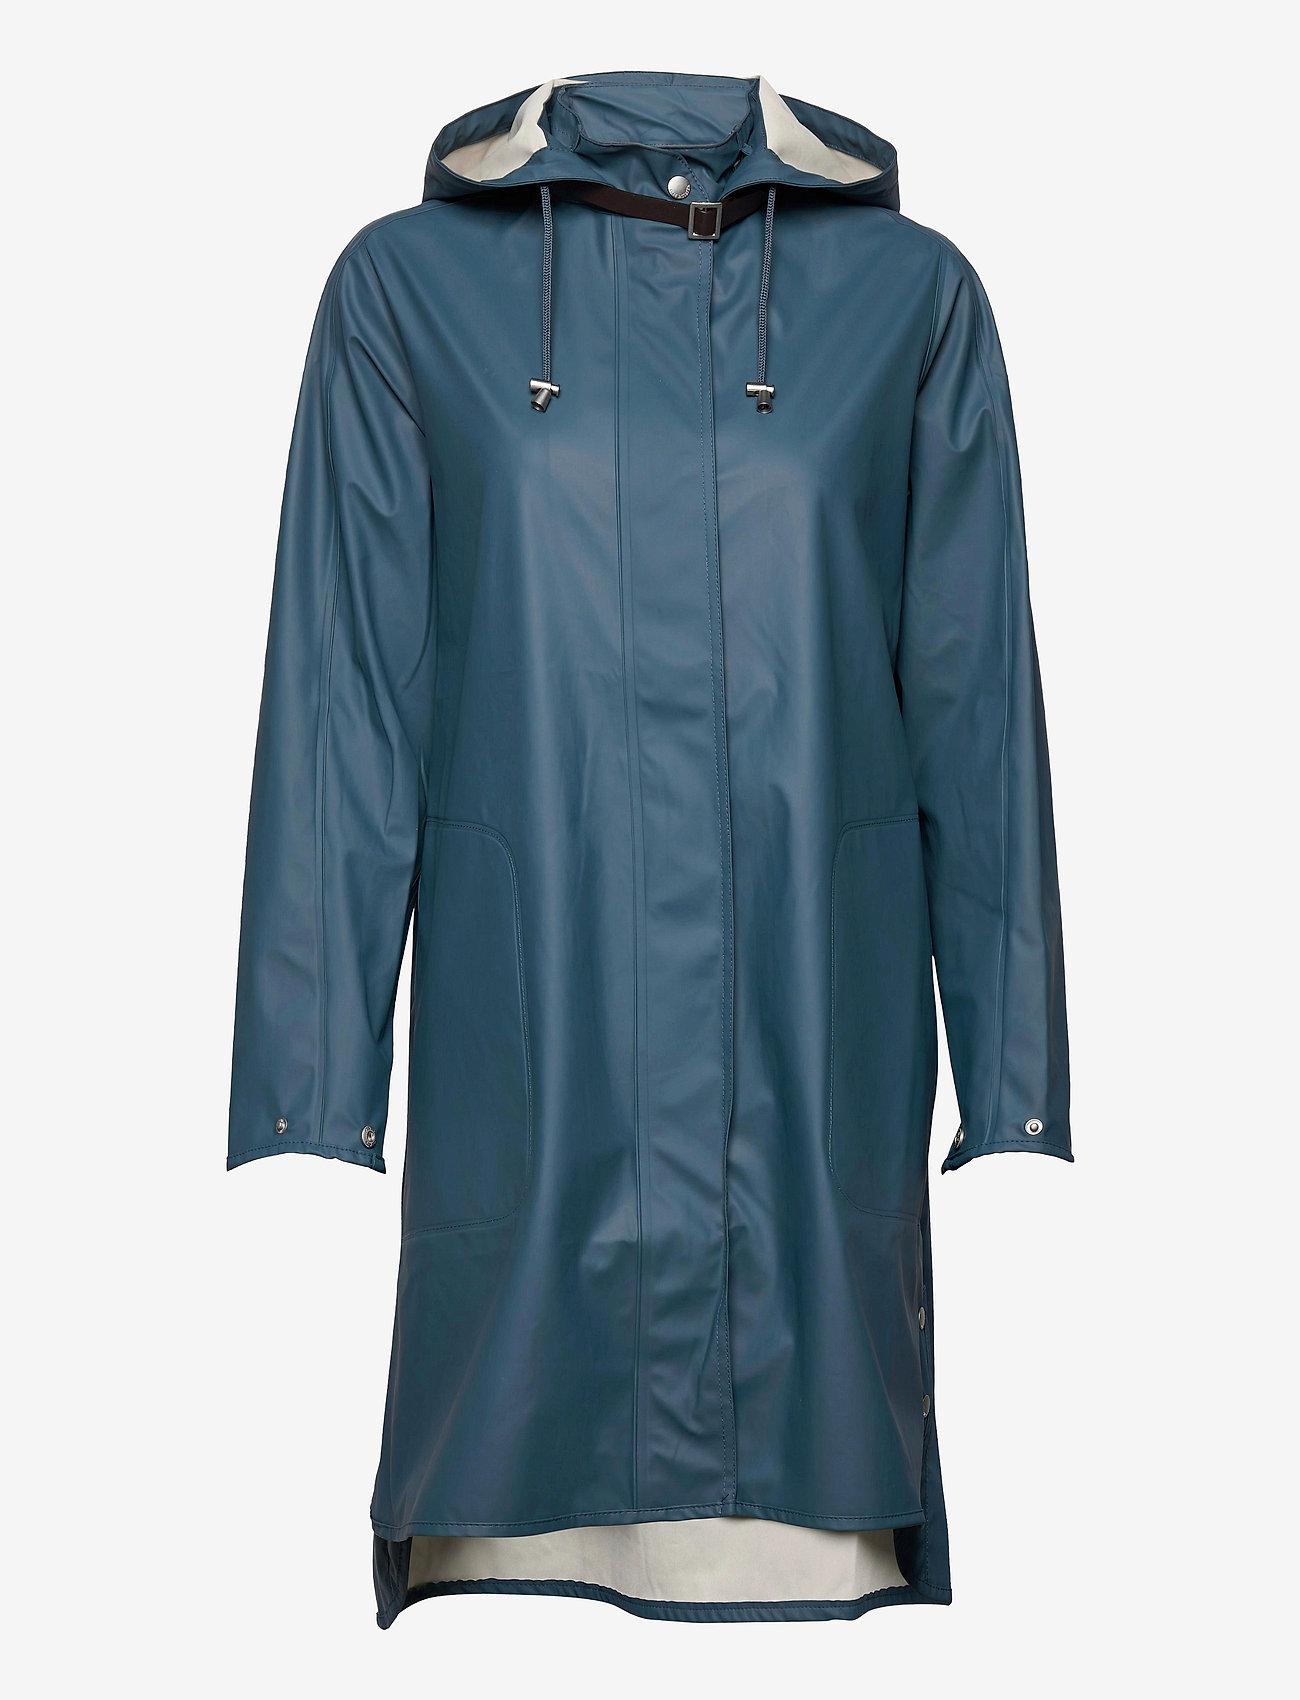 Ilse Jacobsen - RAINCOAT - regnjakker - orion blue - 0